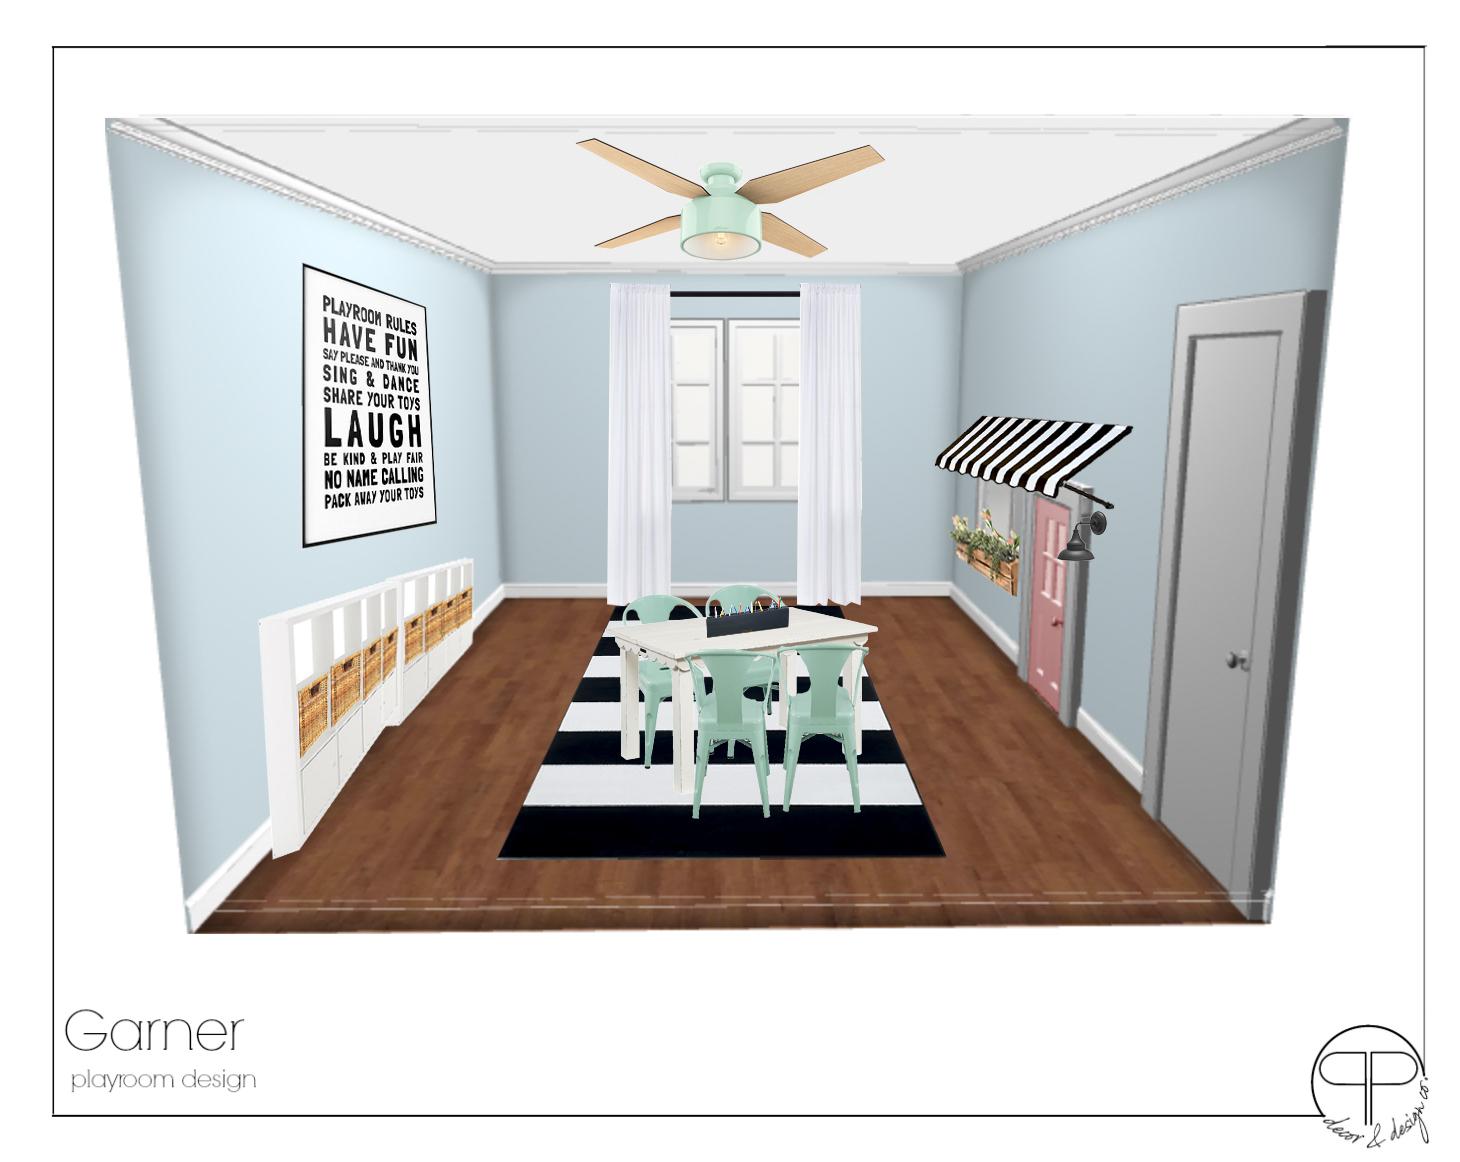 Garner_Playroom_Design_3.jpg